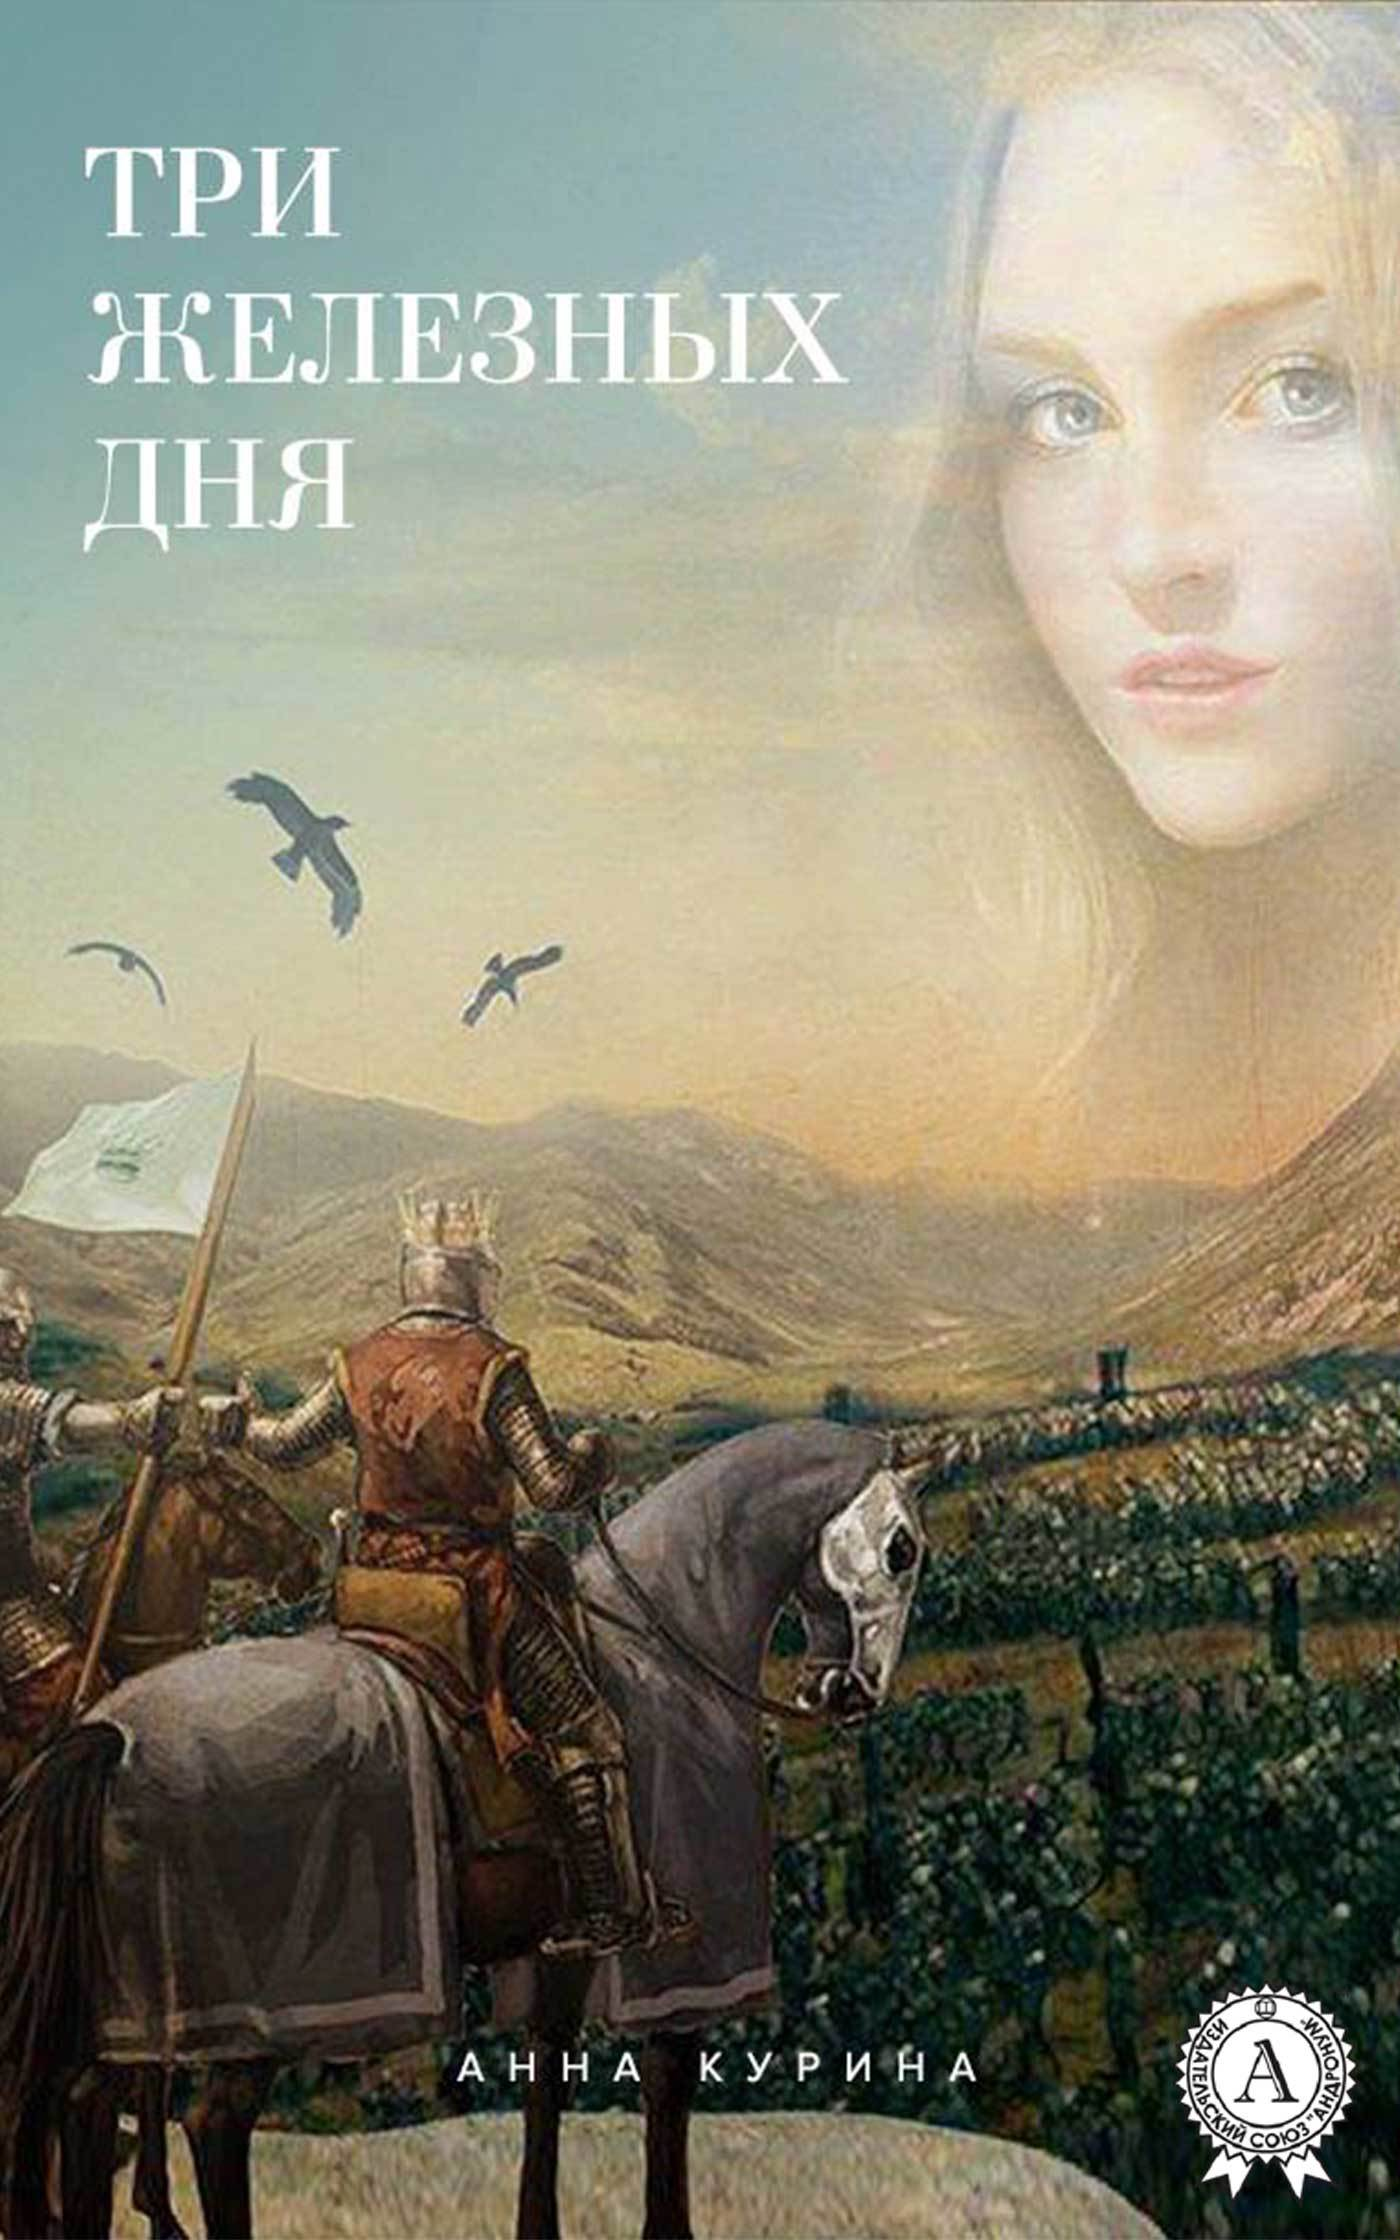 На обложке символ данного произведения 27/65/18/27651839.bin.dir/27651839.cover.jpg обложка